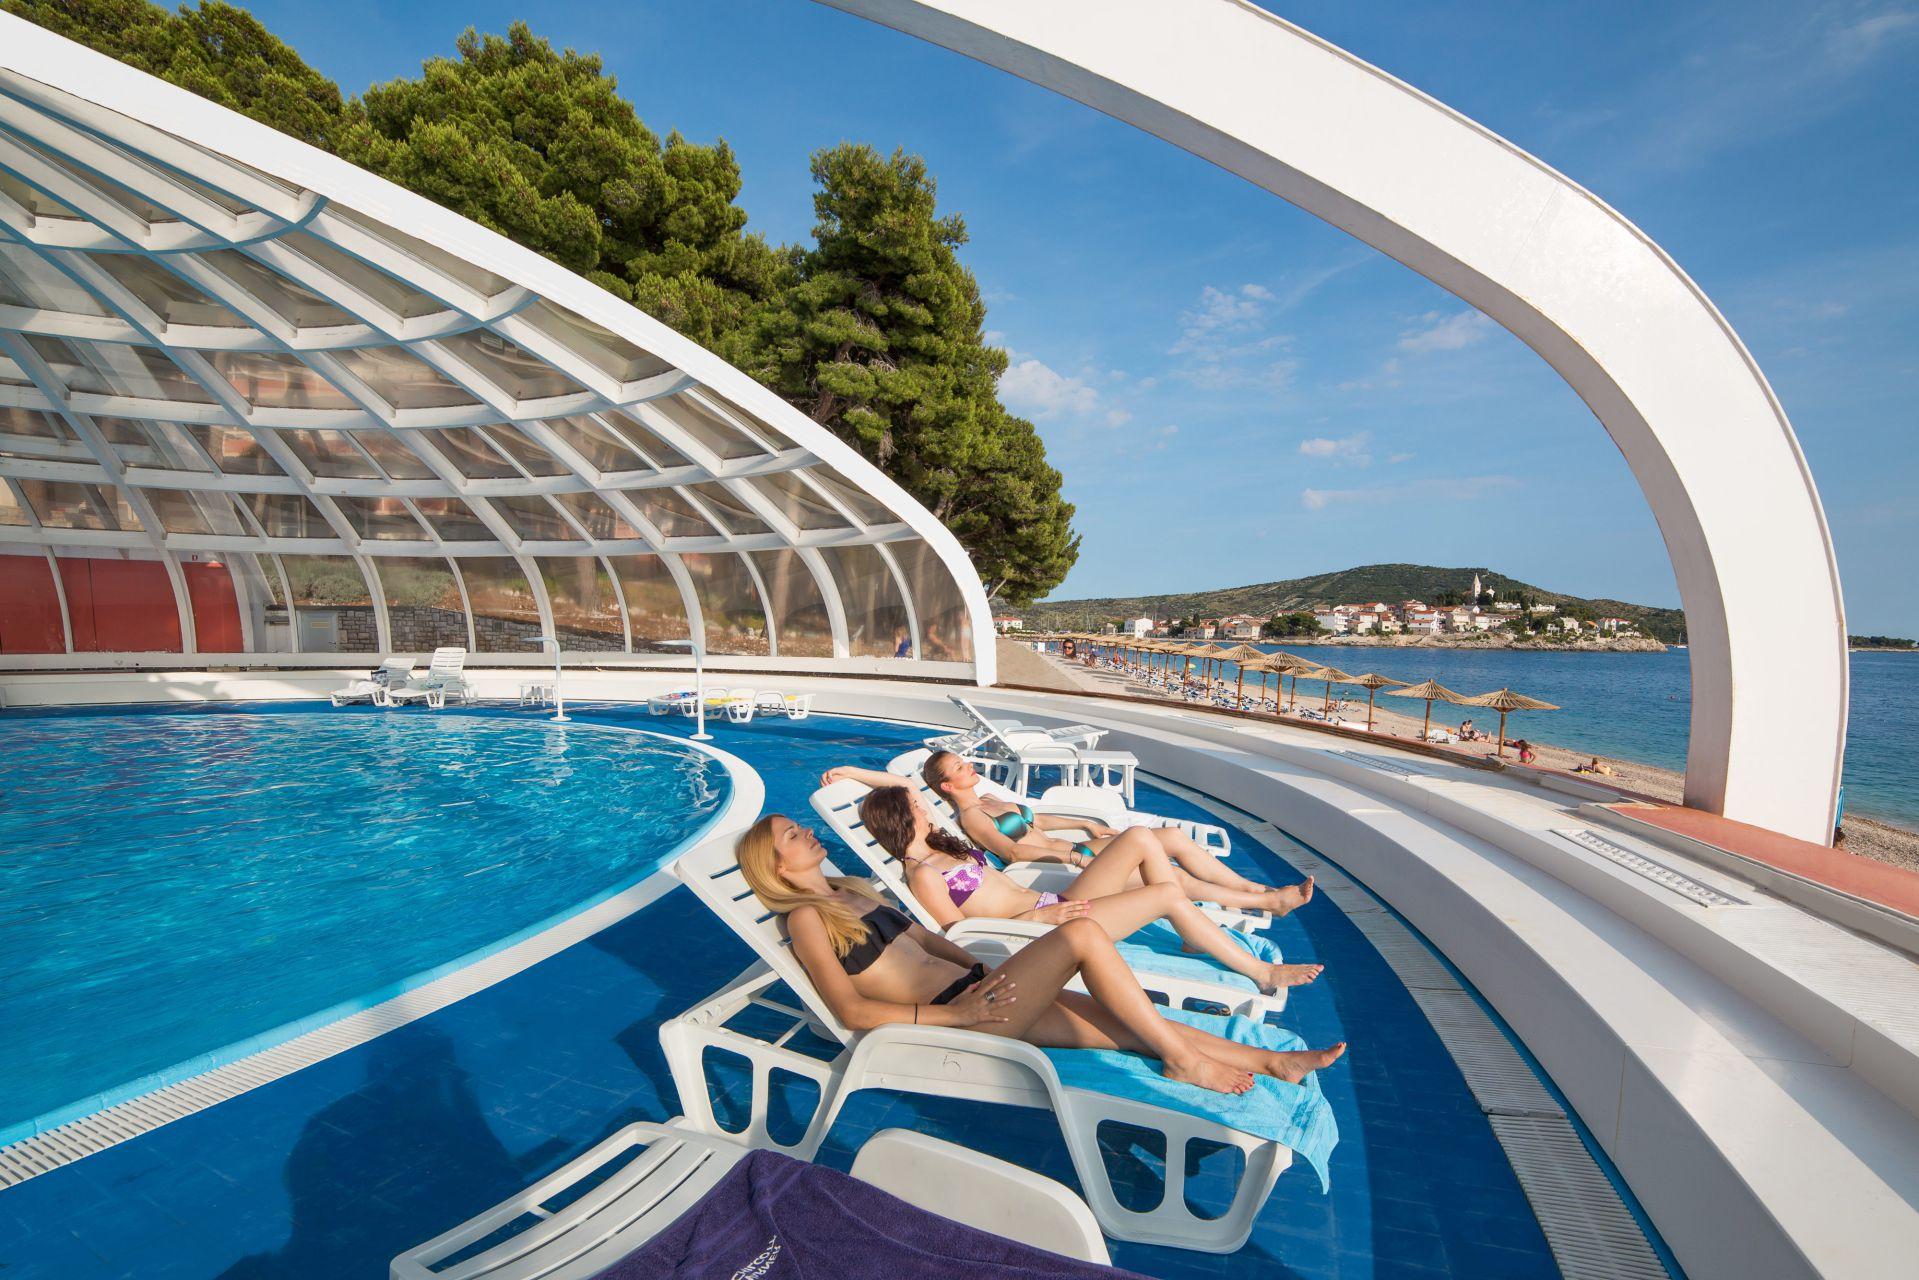 swimming pool 08 14845706093 o - Zora Hotel